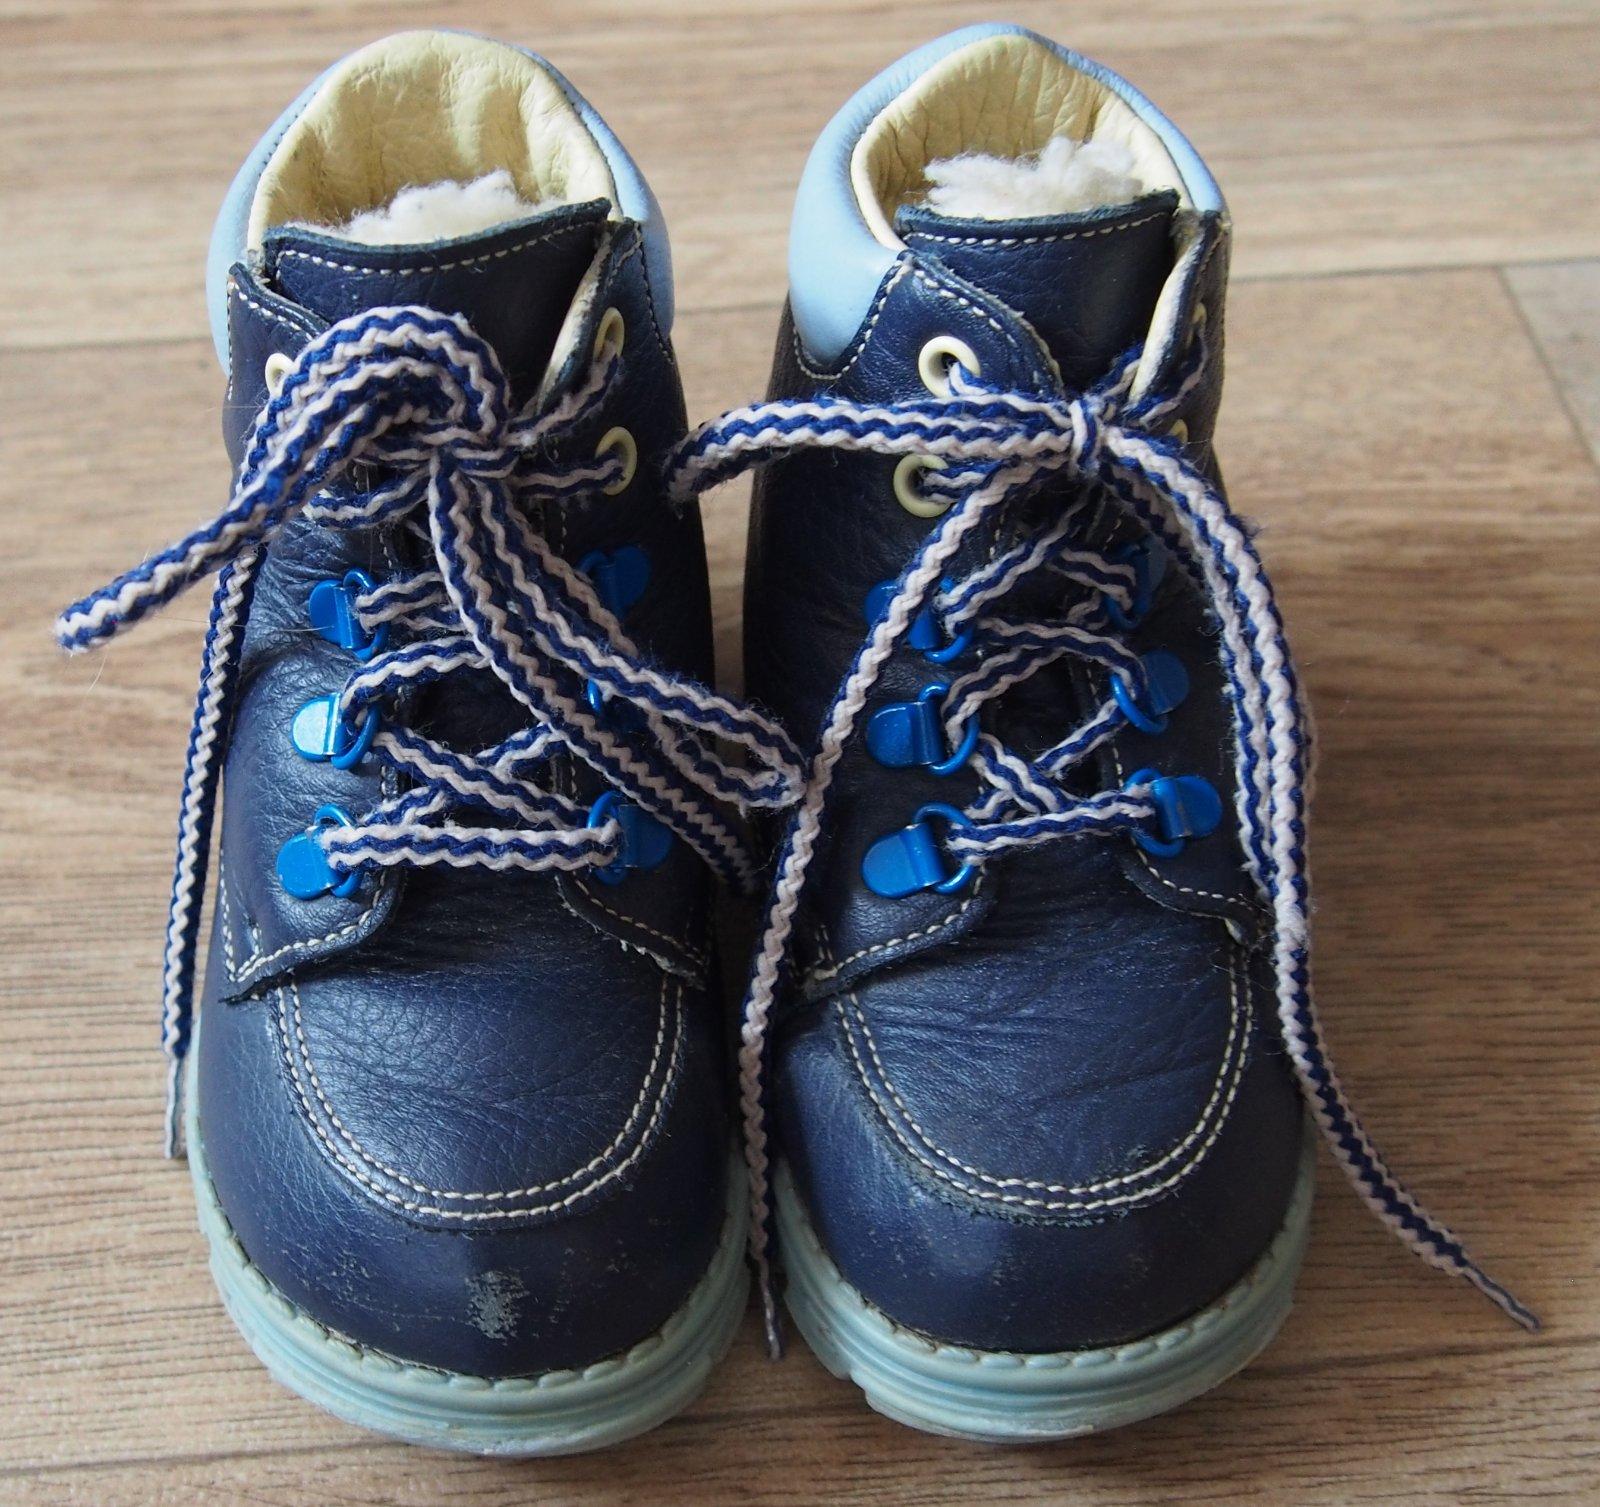 1fec1d81d8c Chlapecké zimní boty vel.21